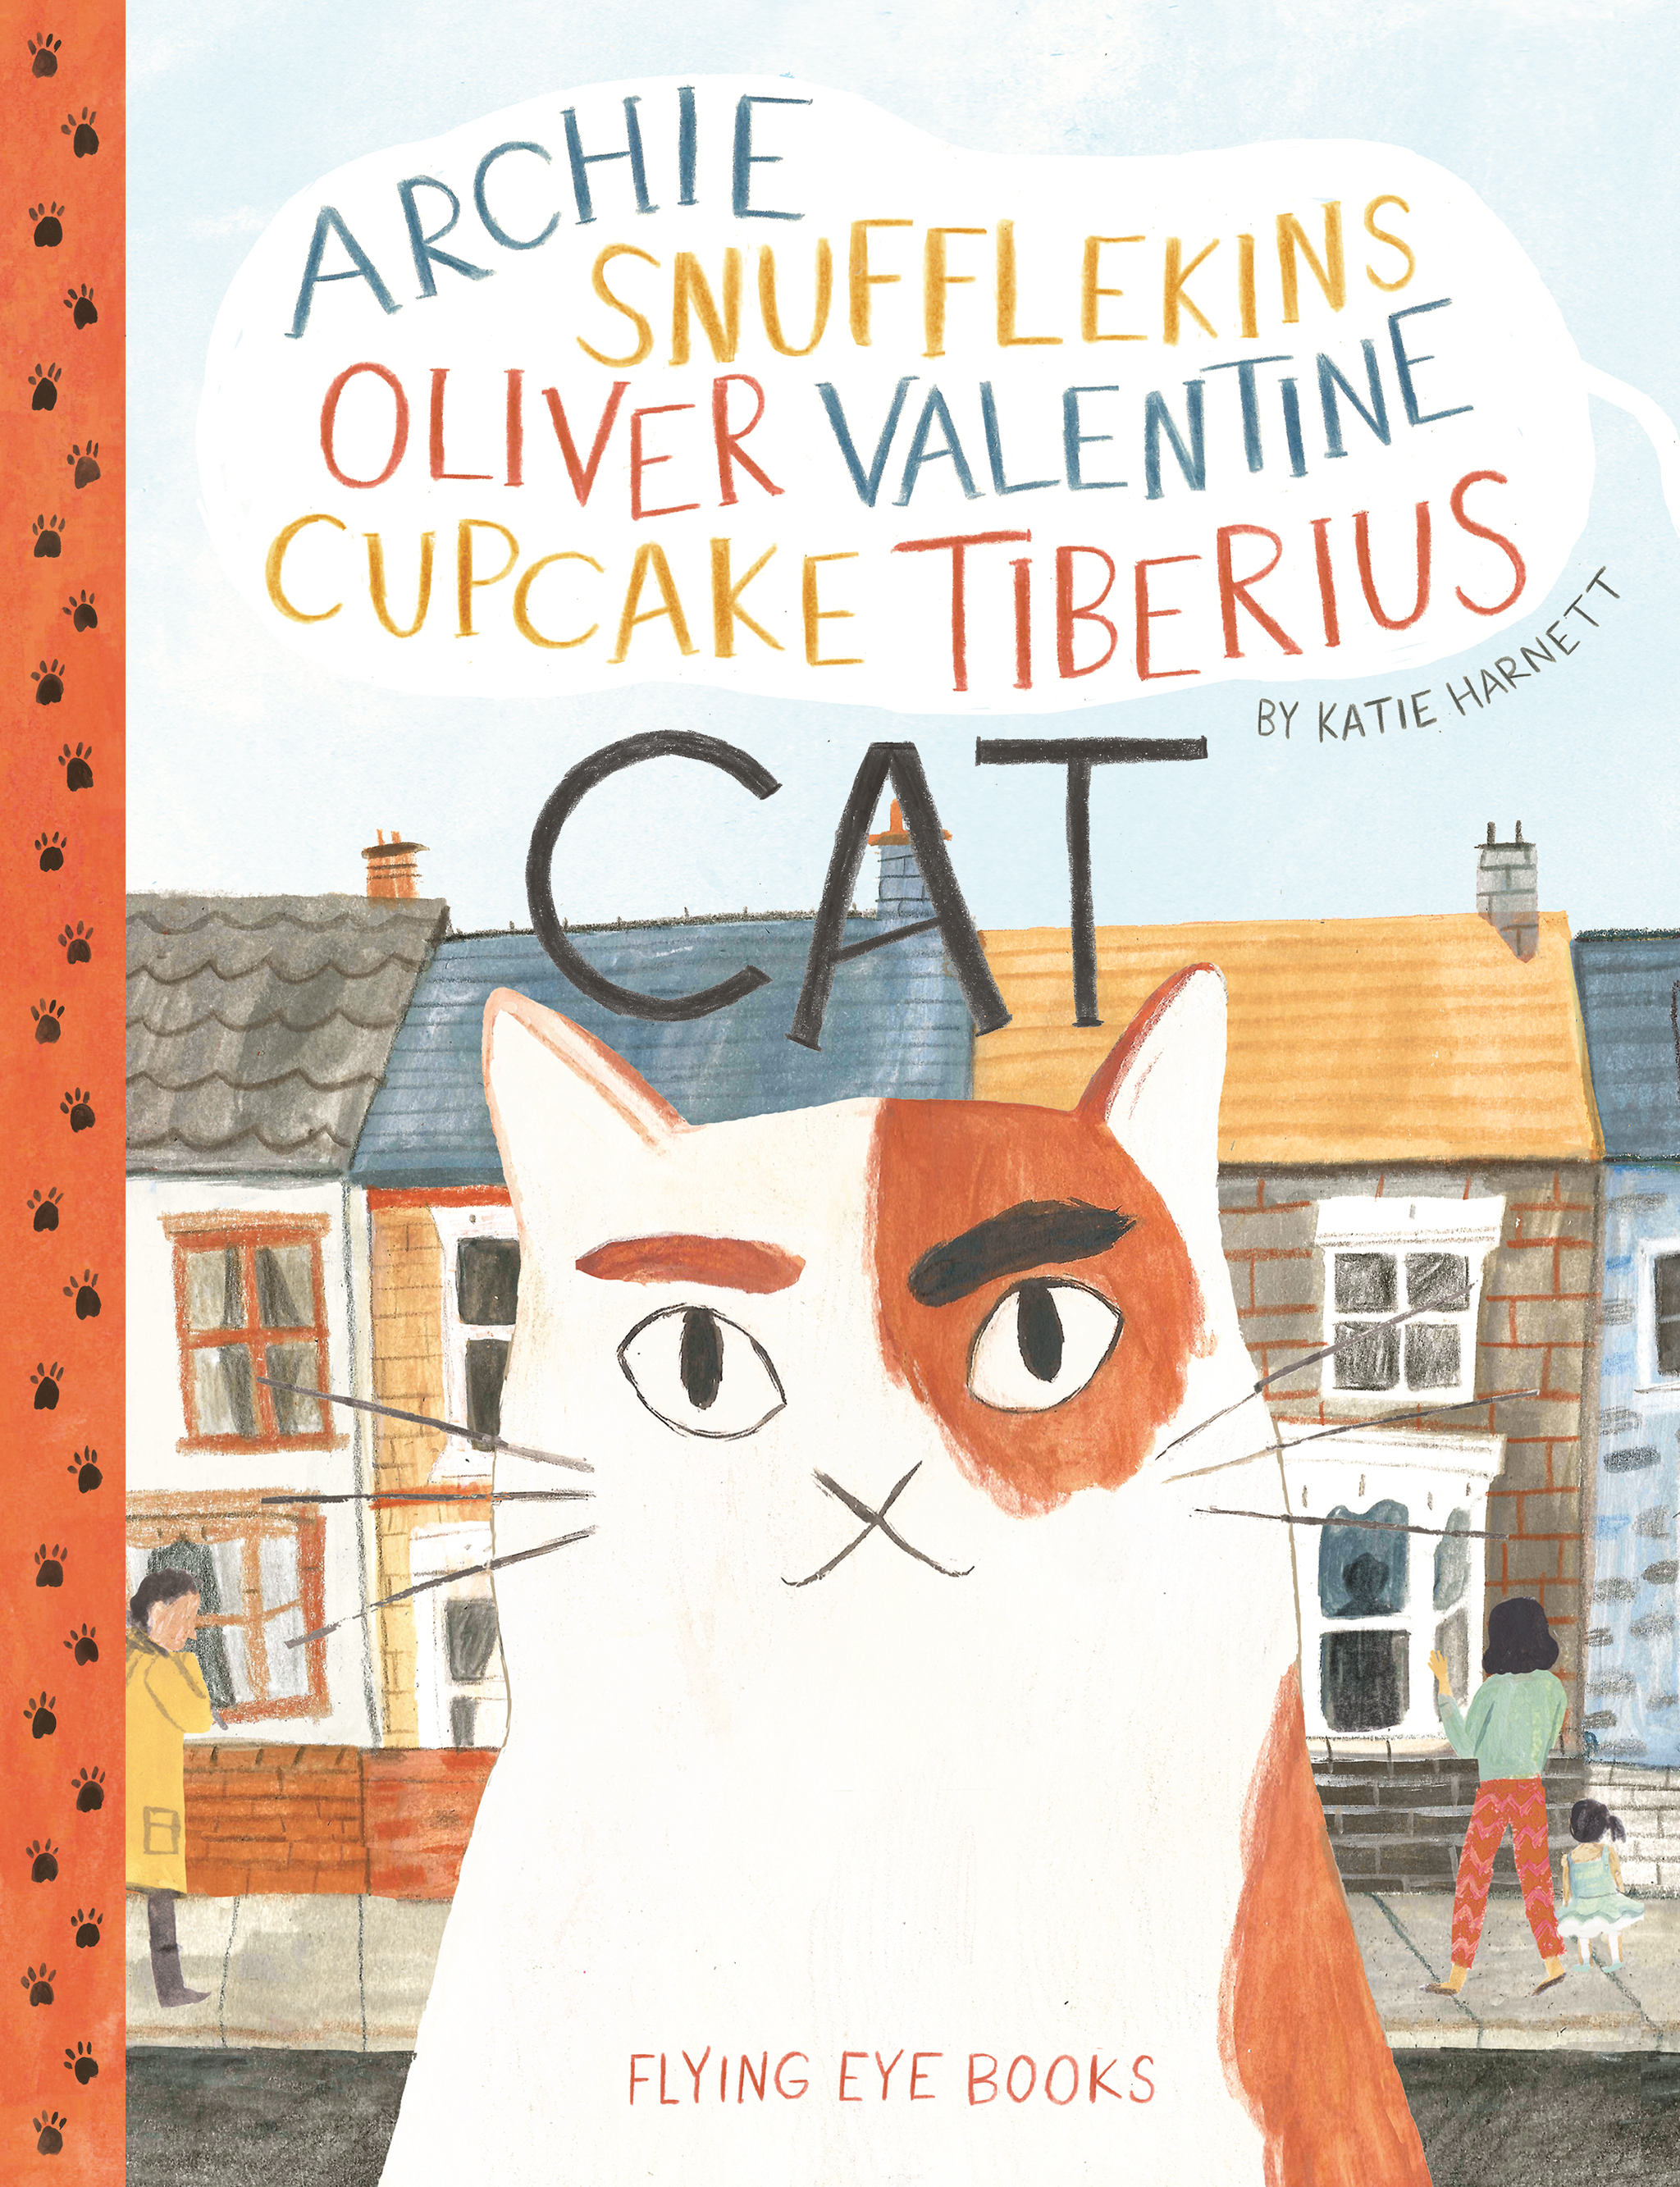 Archie Cupcake Valentine Snufflekins Tiberius Cat